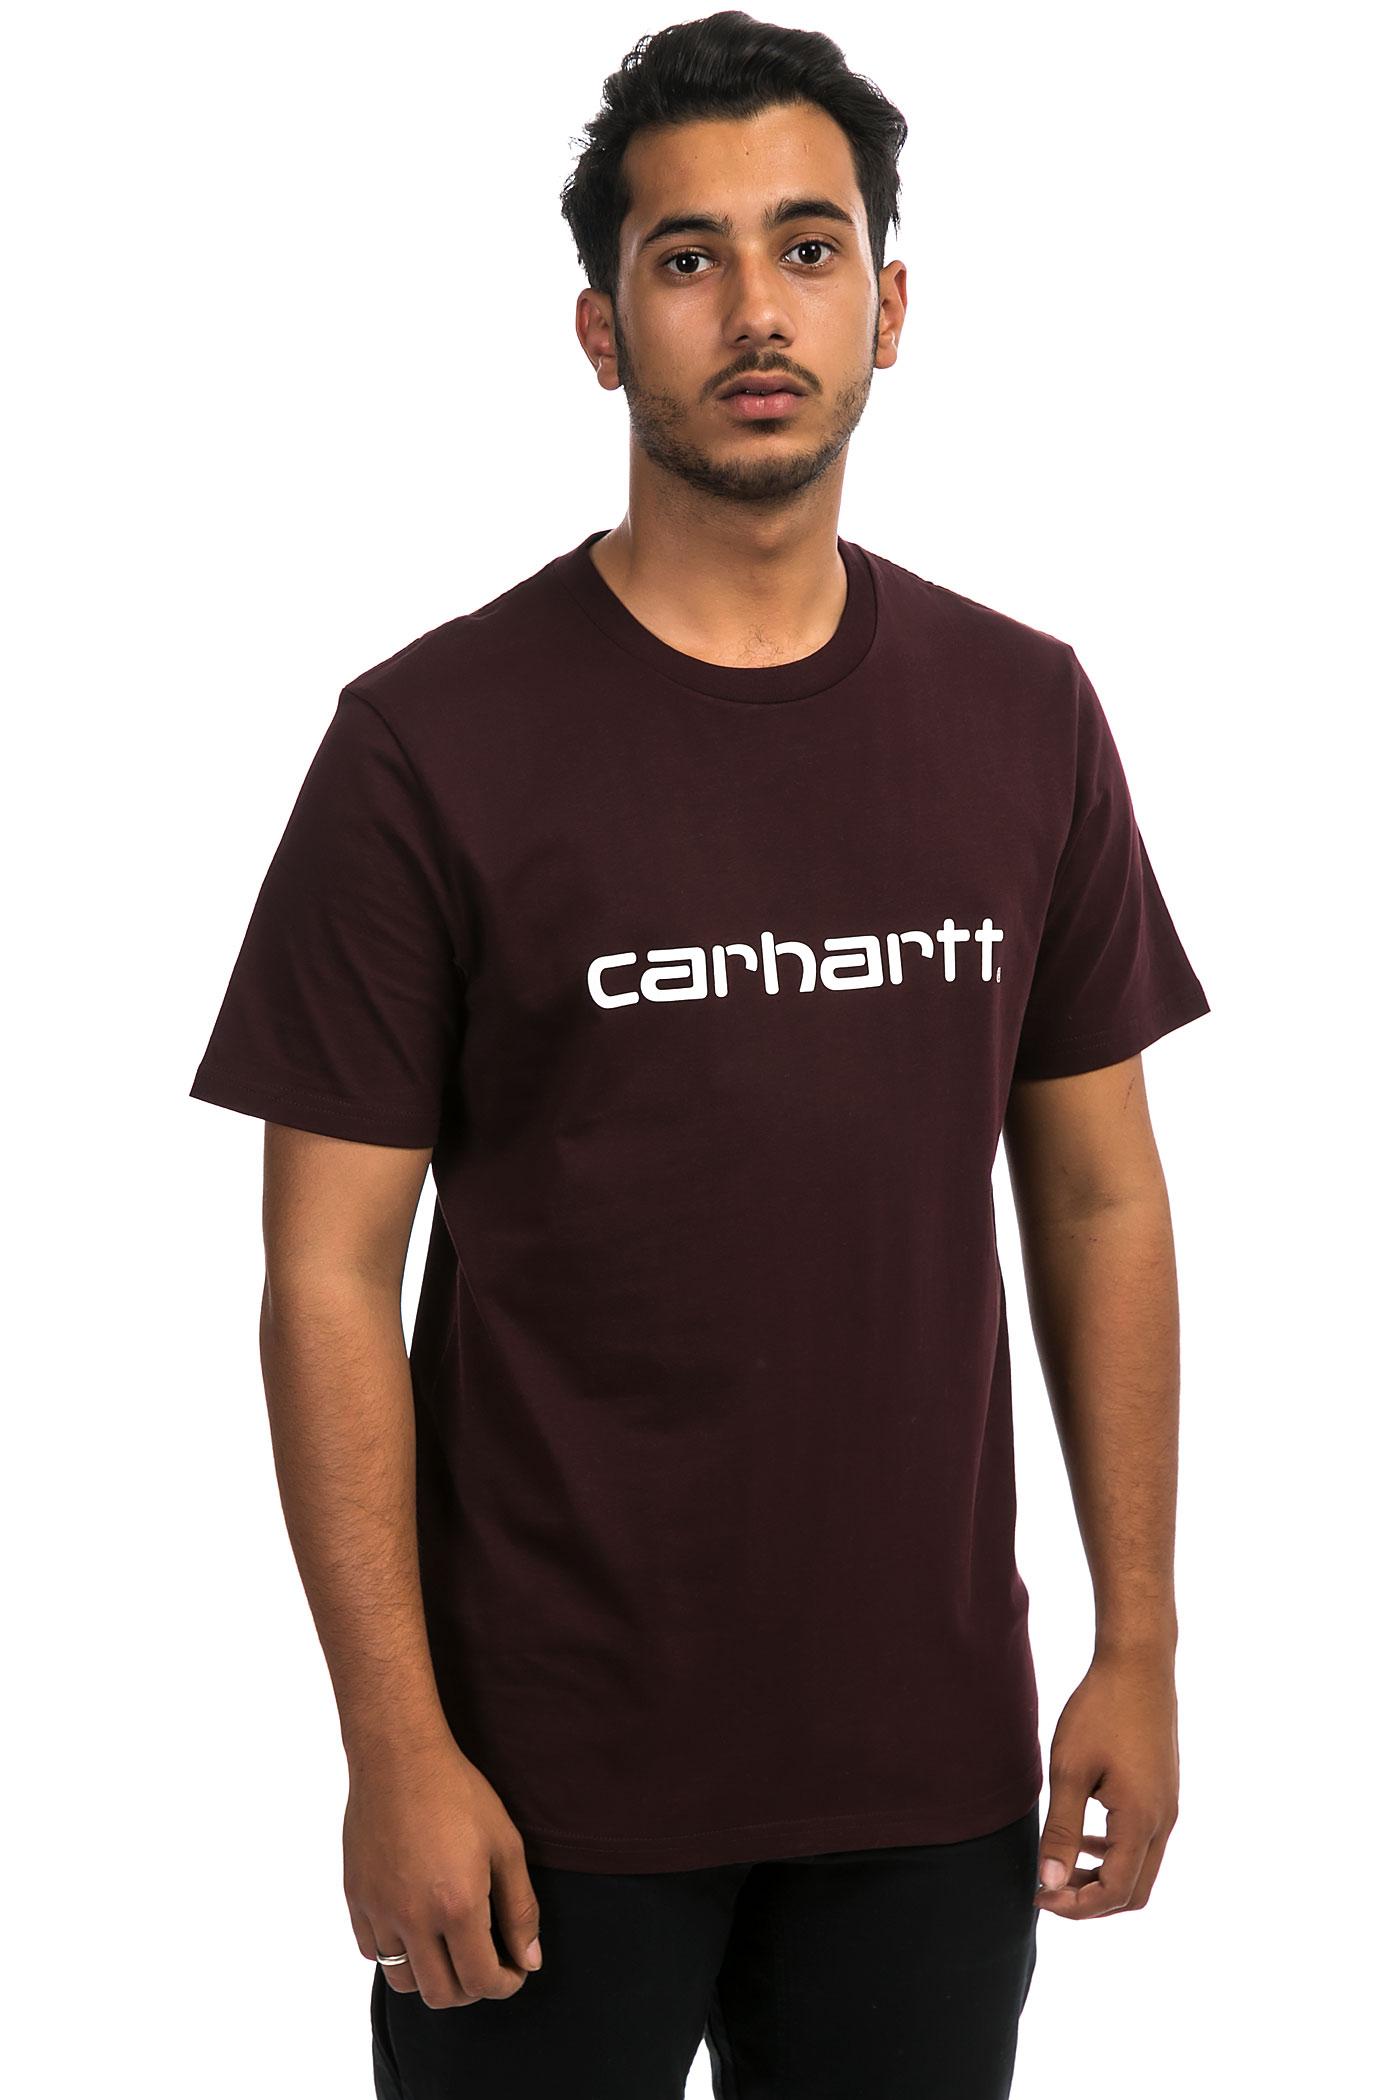 carhartt wip script t shirt damson white buy at skatedeluxe. Black Bedroom Furniture Sets. Home Design Ideas